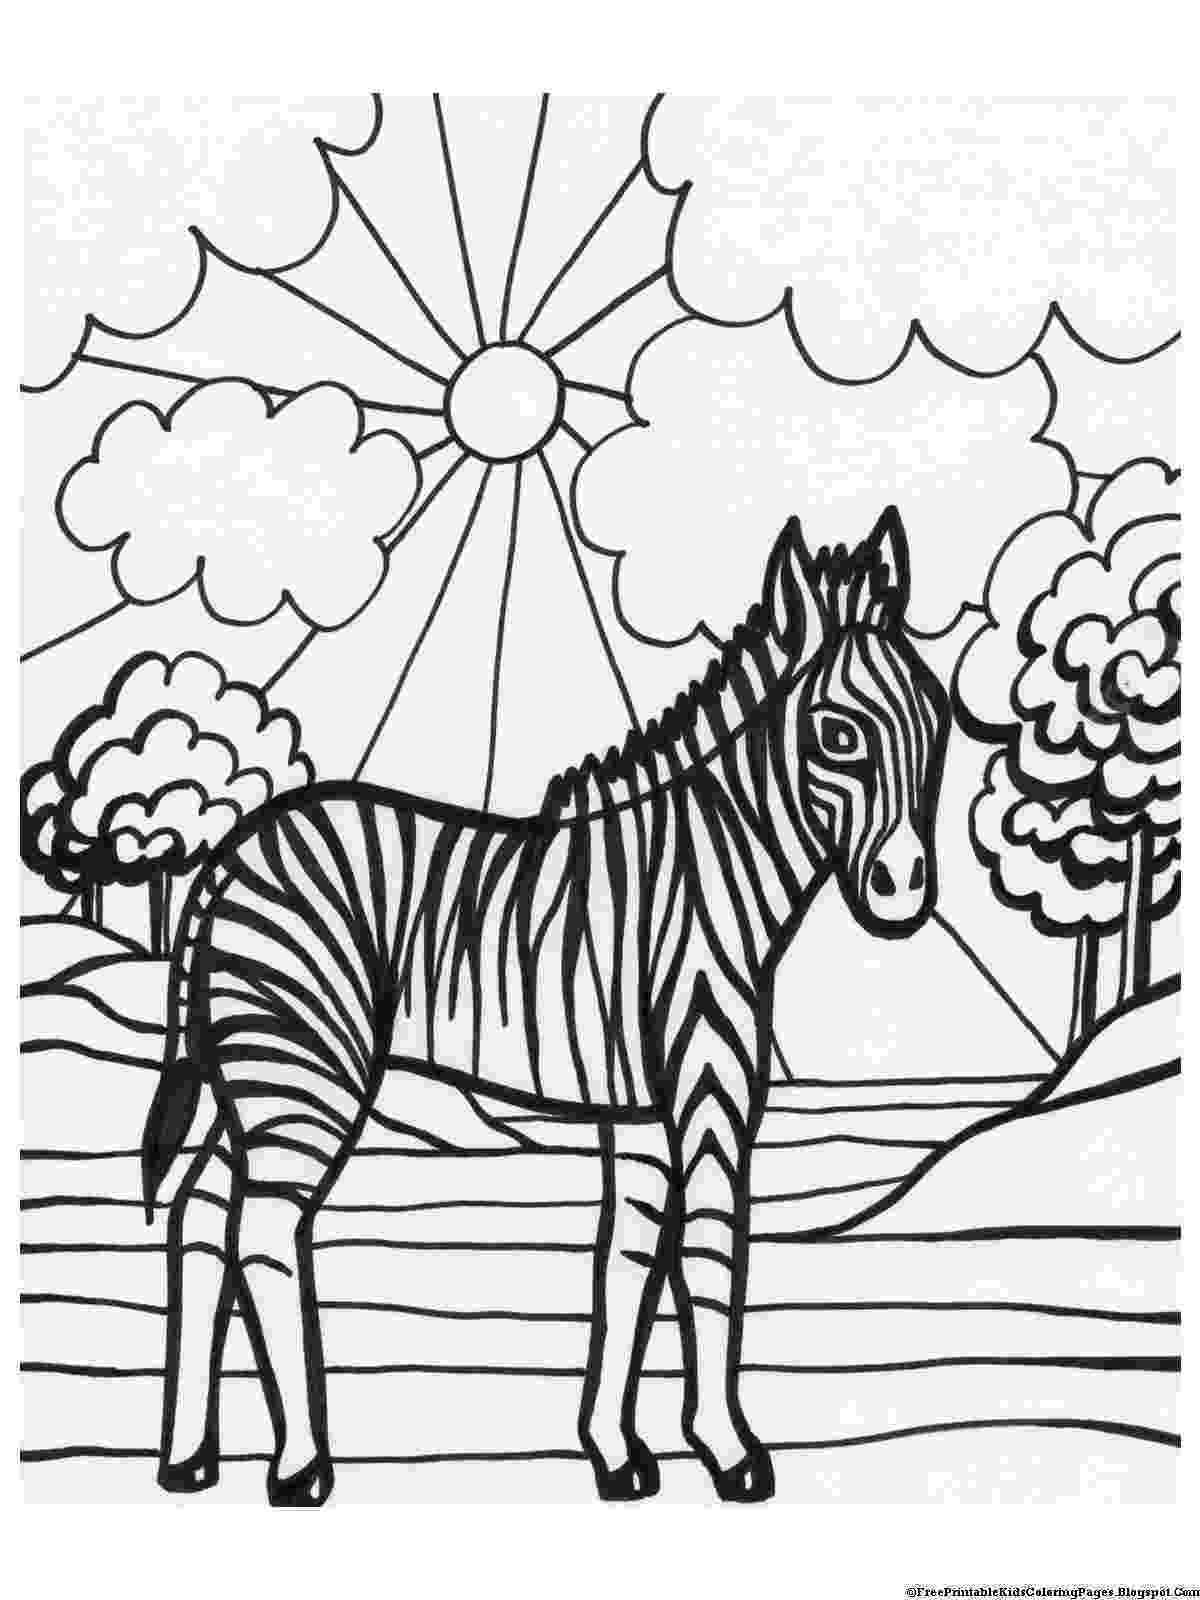 coloring pages printable free printable tangled coloring pages for kids cool2bkids coloring pages printable